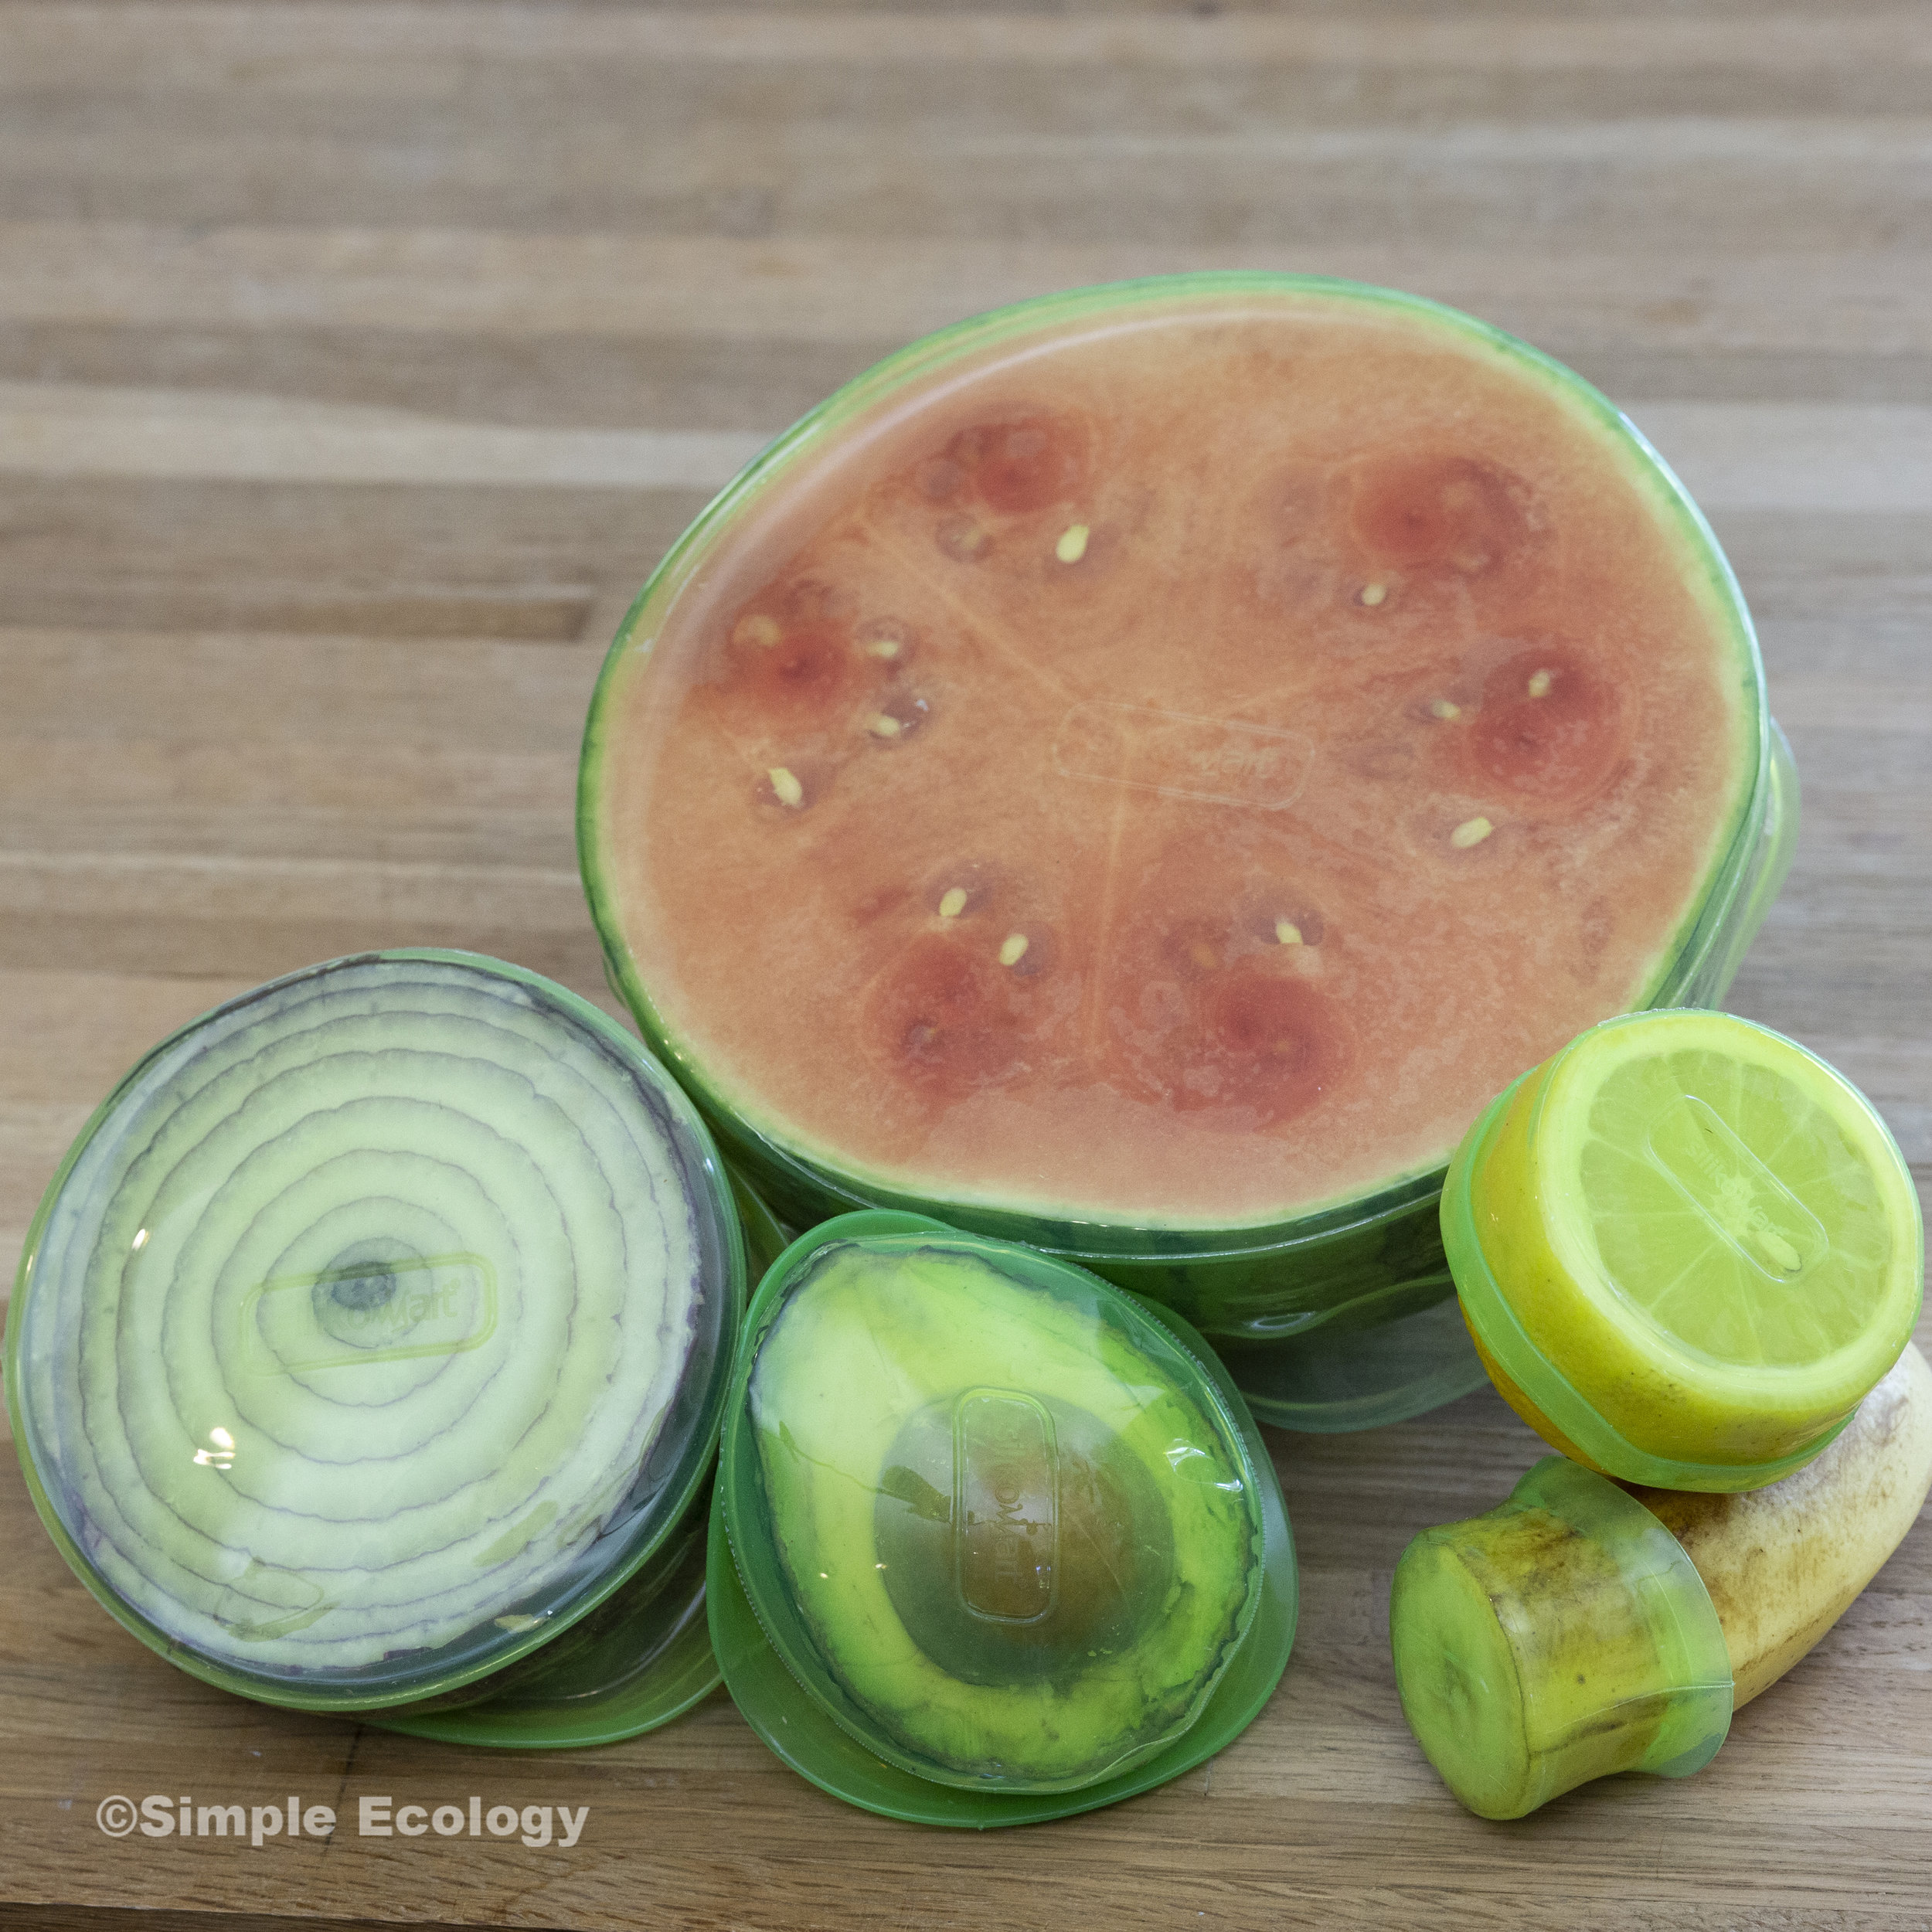 Capflex On Fruit Original.jpg